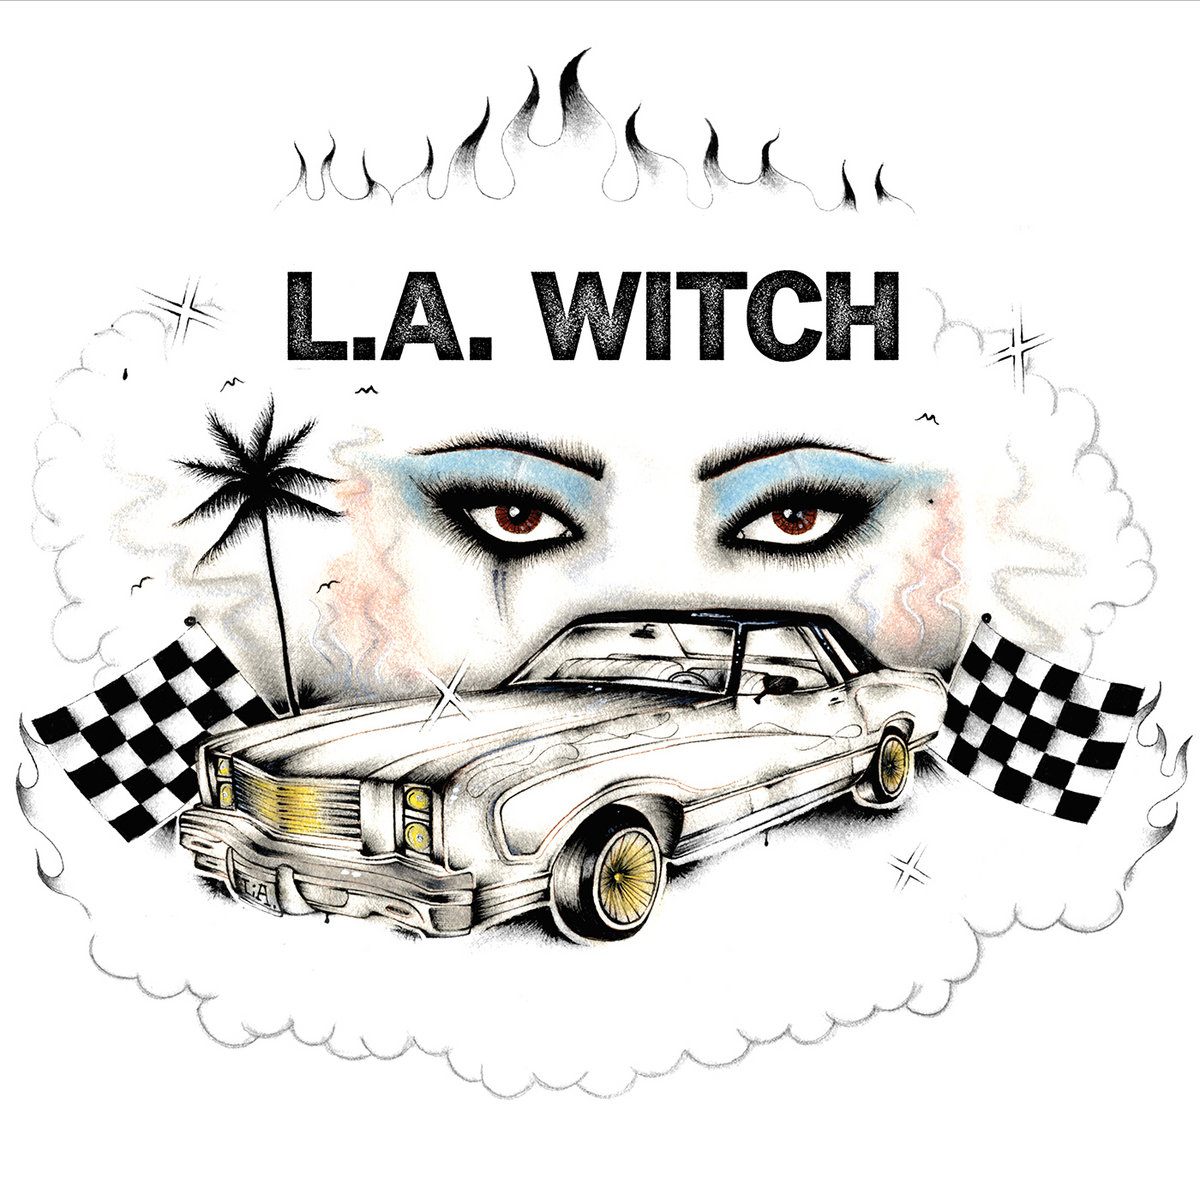 l a witch